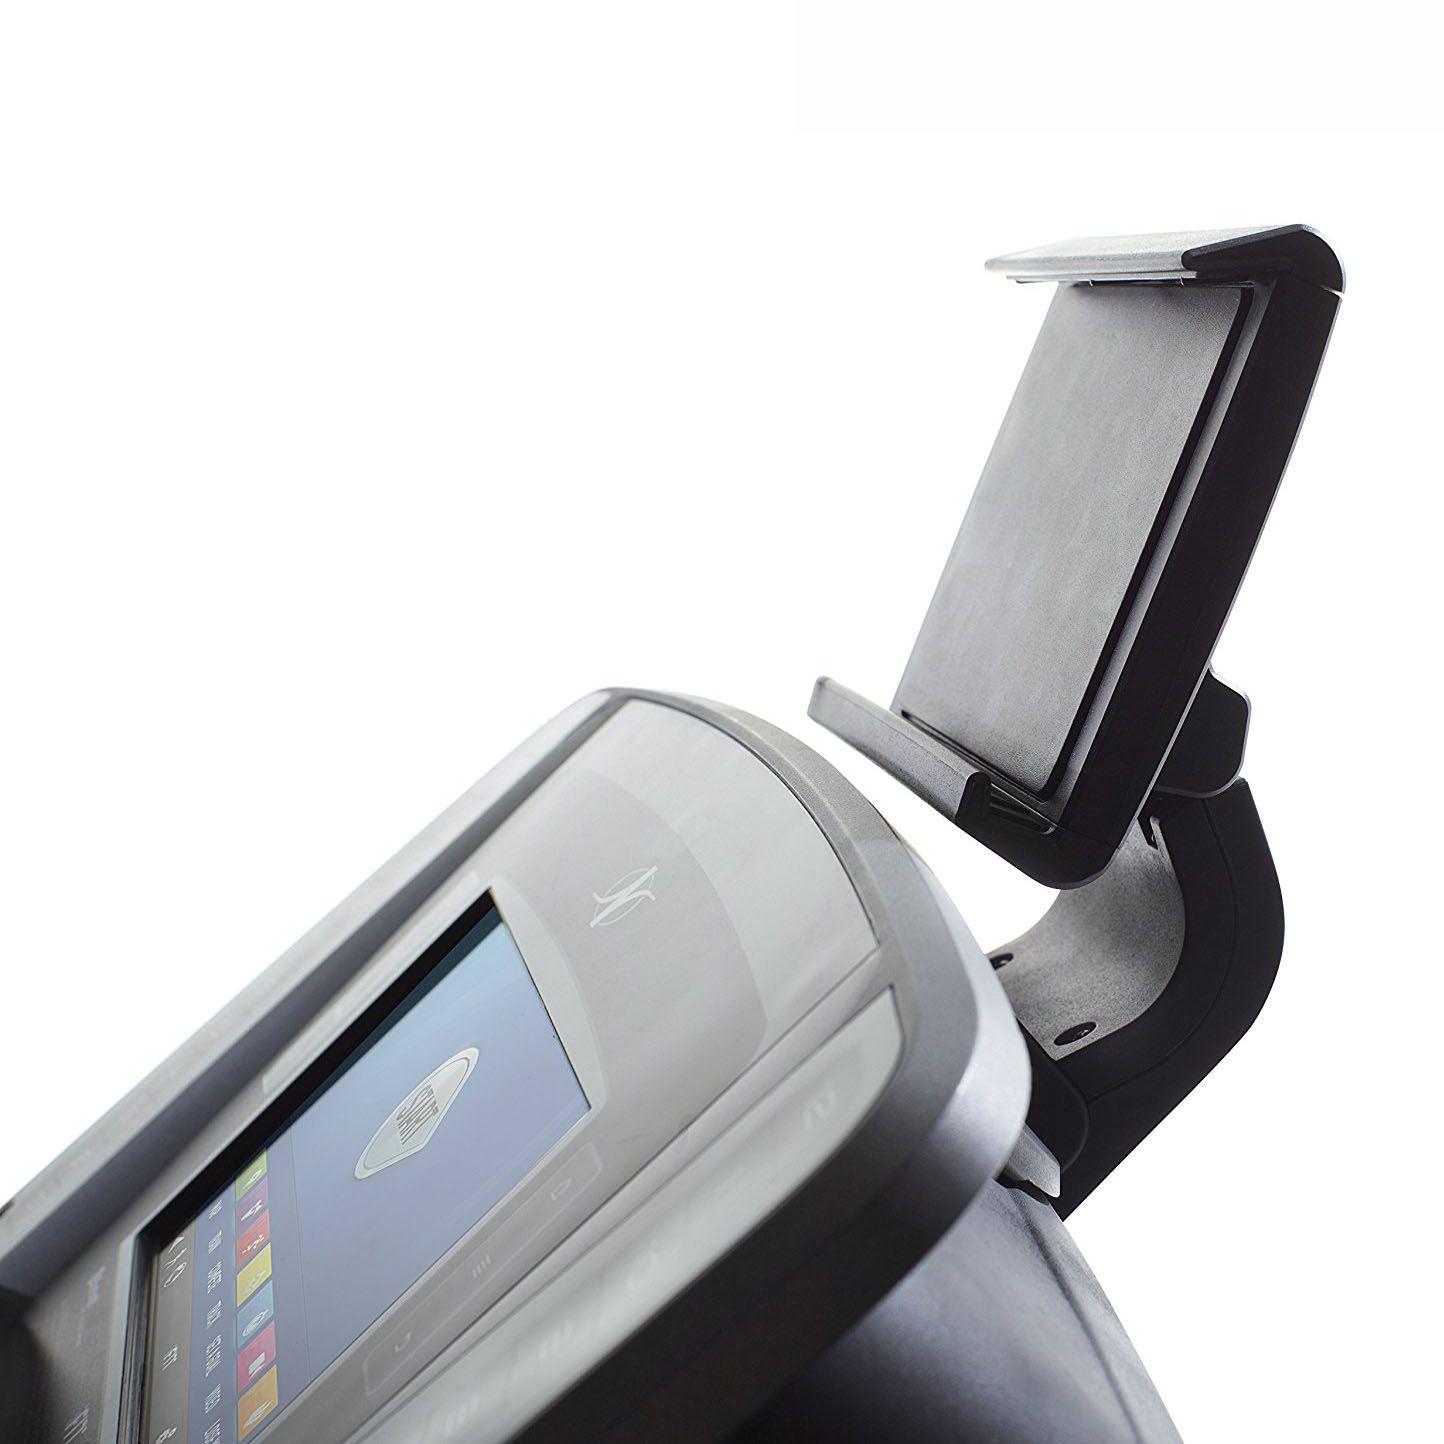 Motor Mount Price >> NordicTrack C 1650 Treadmill - Sweatband.com